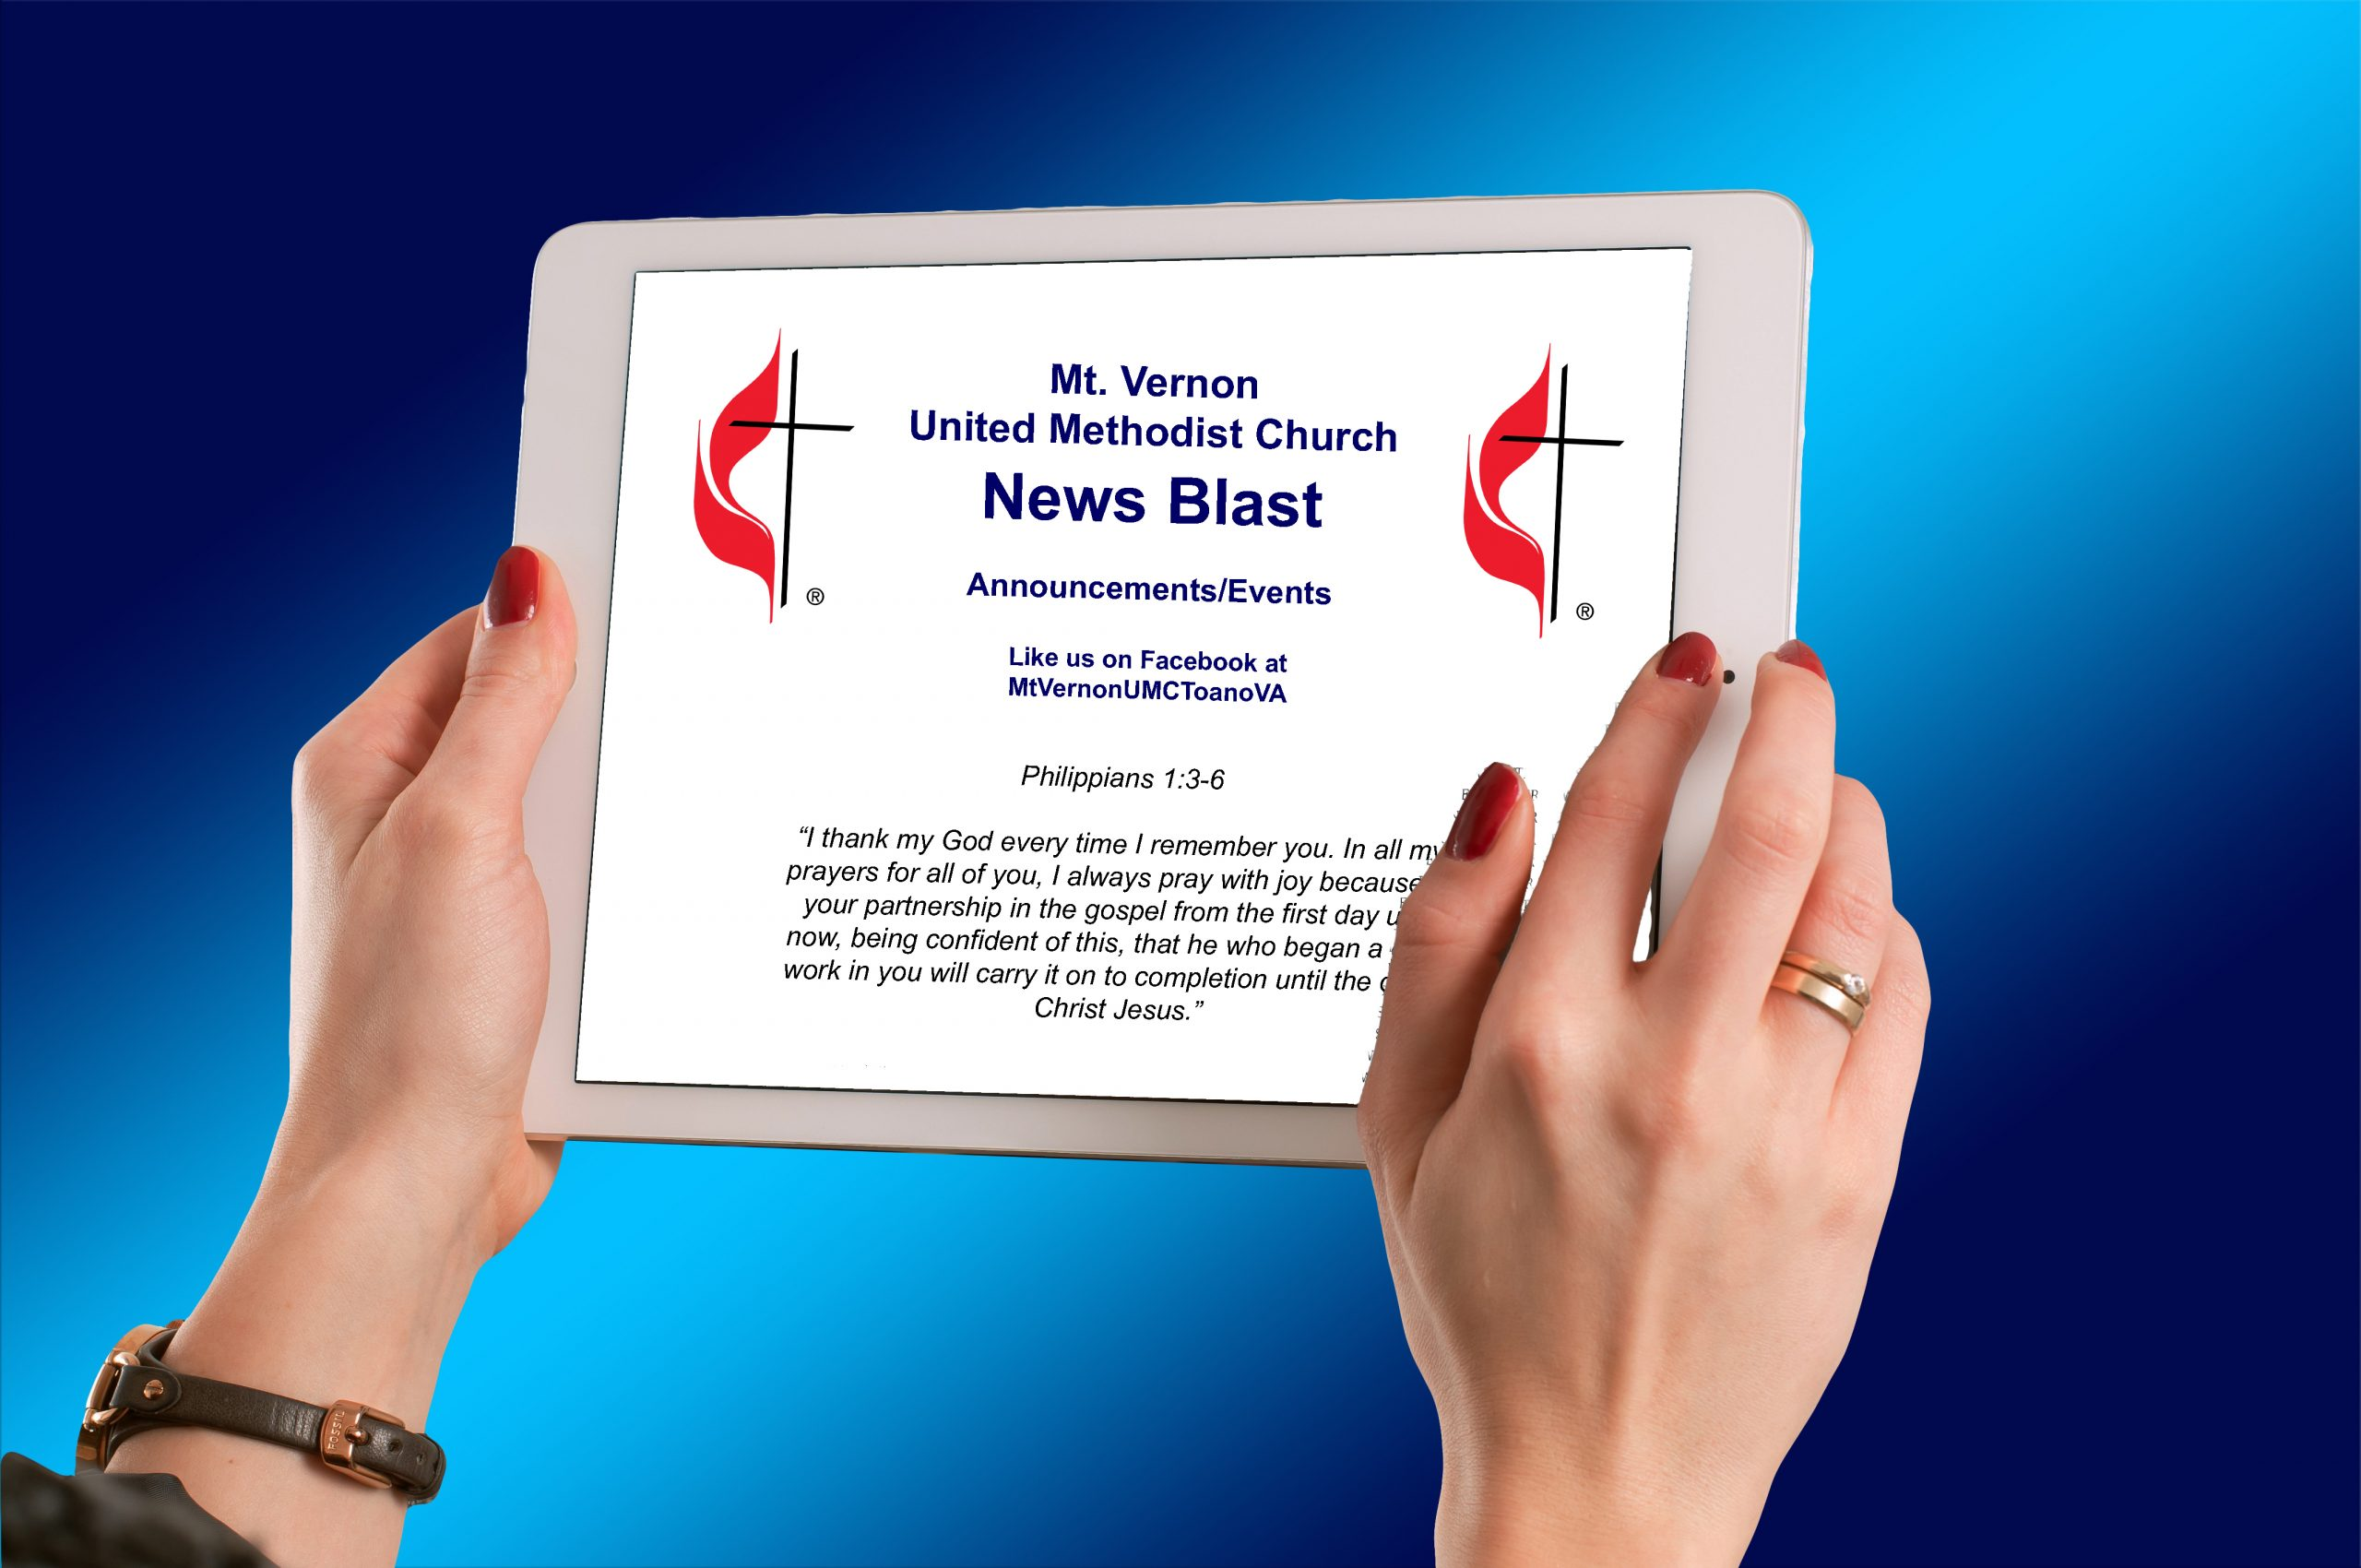 Mt. Vernon UMC News Blast